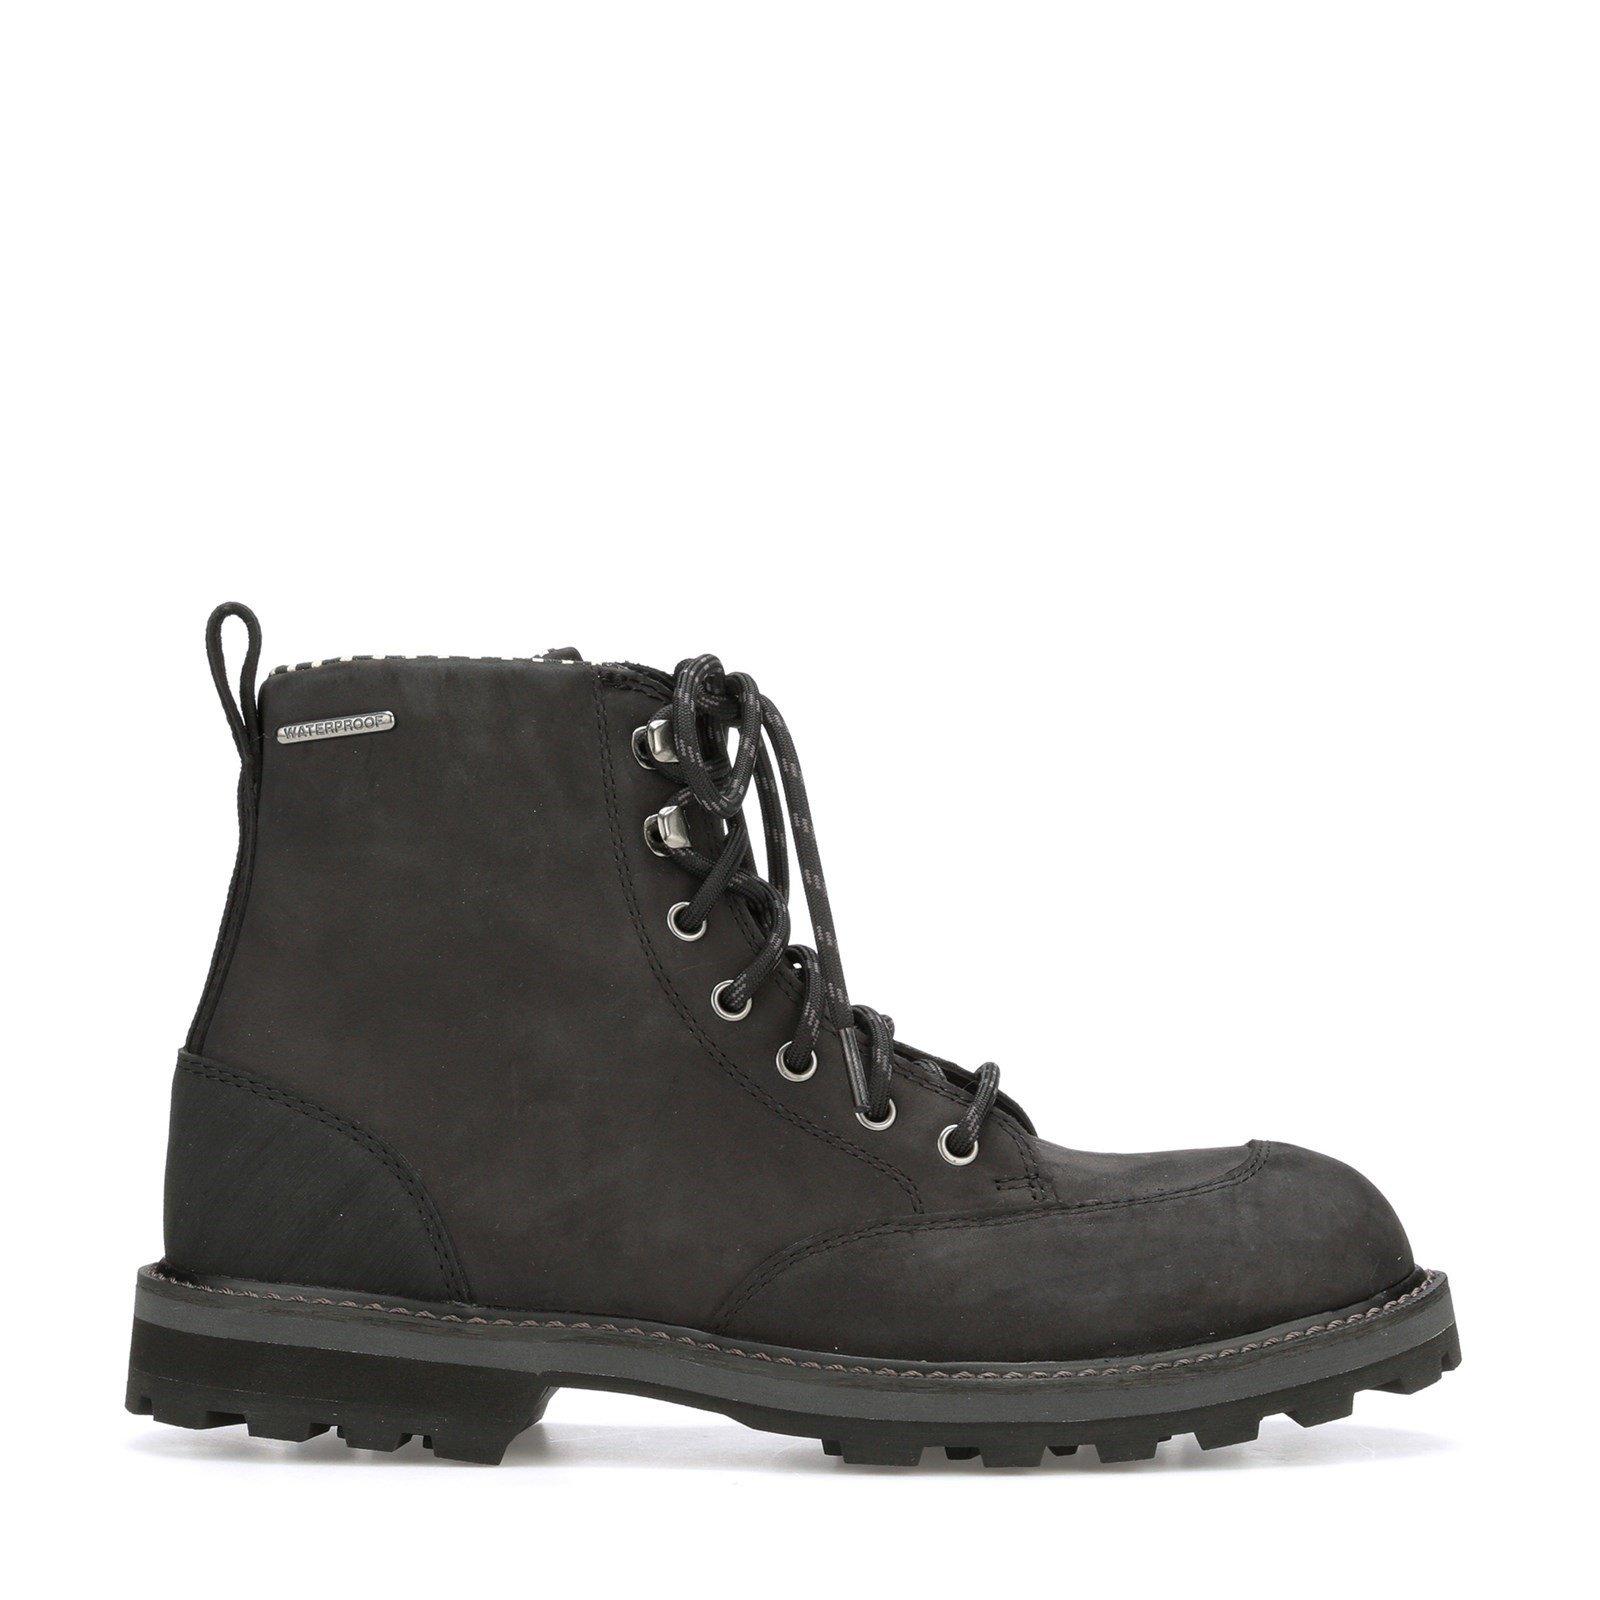 Muck Boots Men's Foreman Boot Black 31854 - Black 10.5